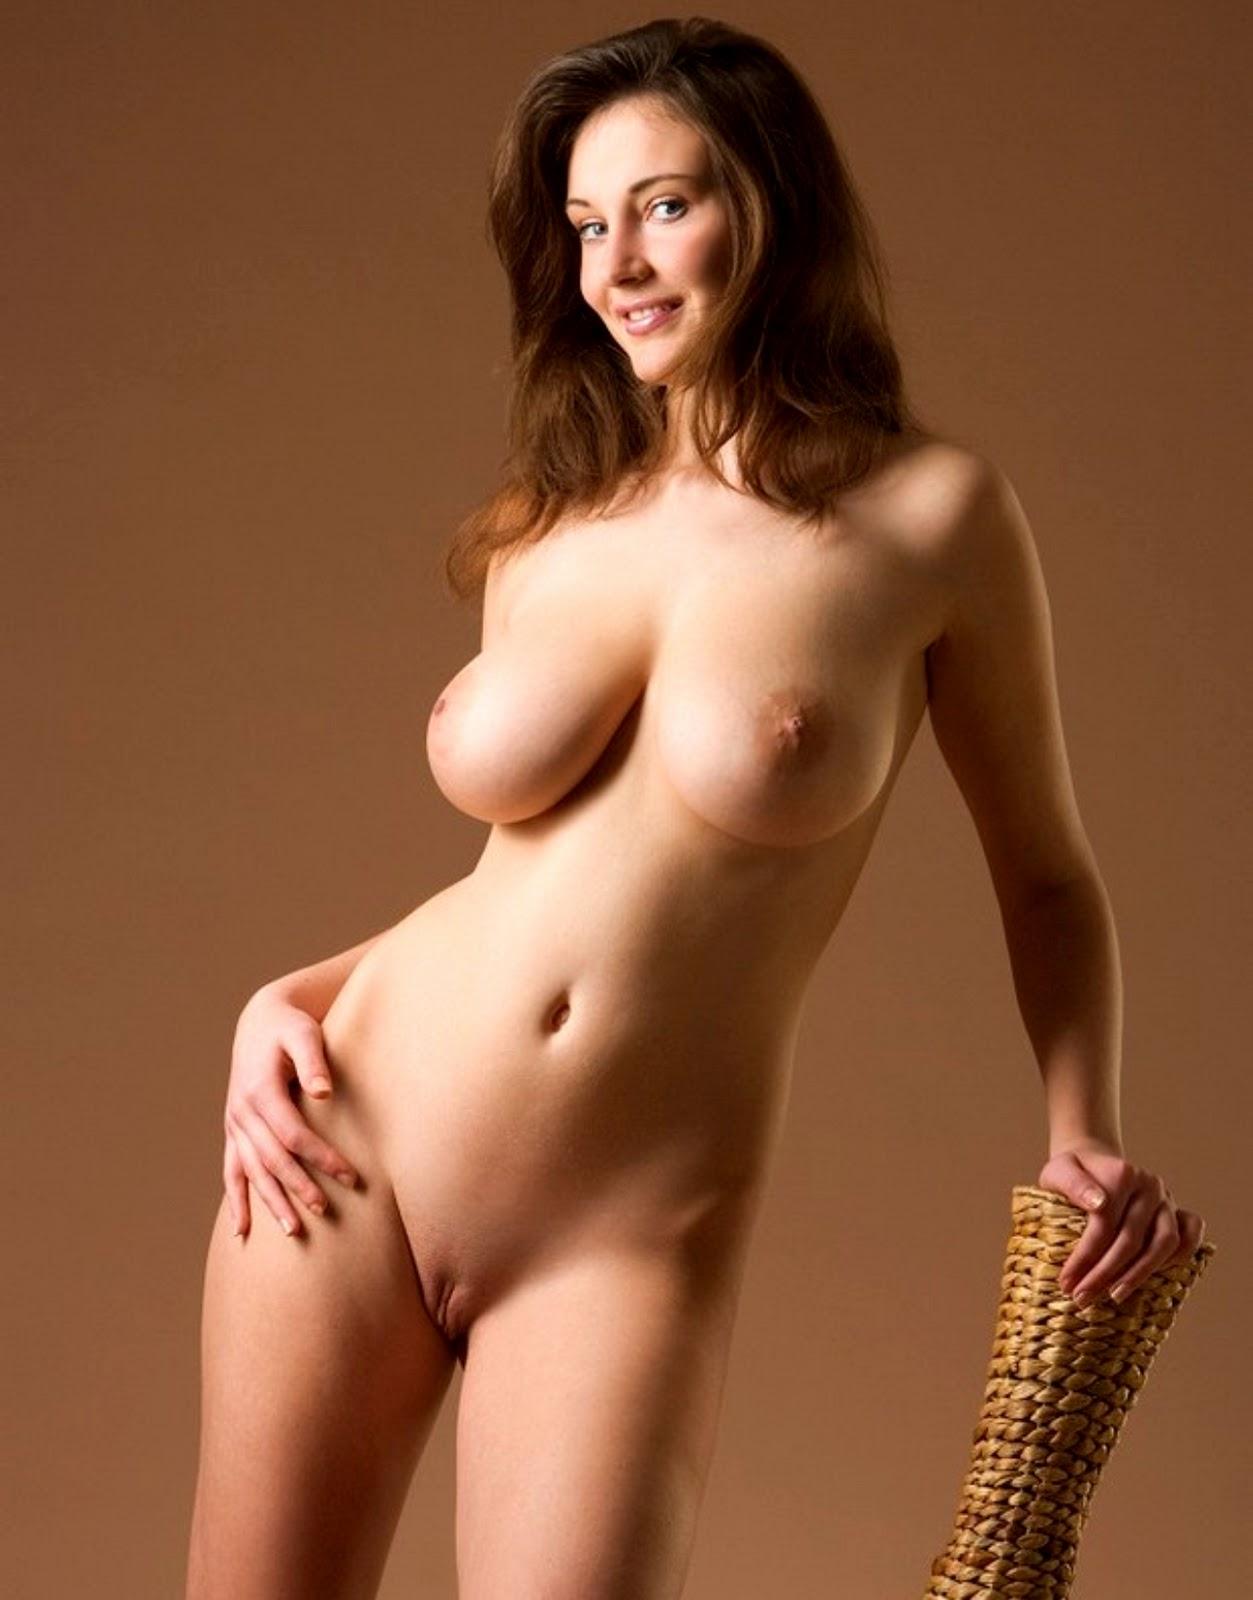 Ashley Harris Porn barbara harris nude images femalecelebrity gallery-41580